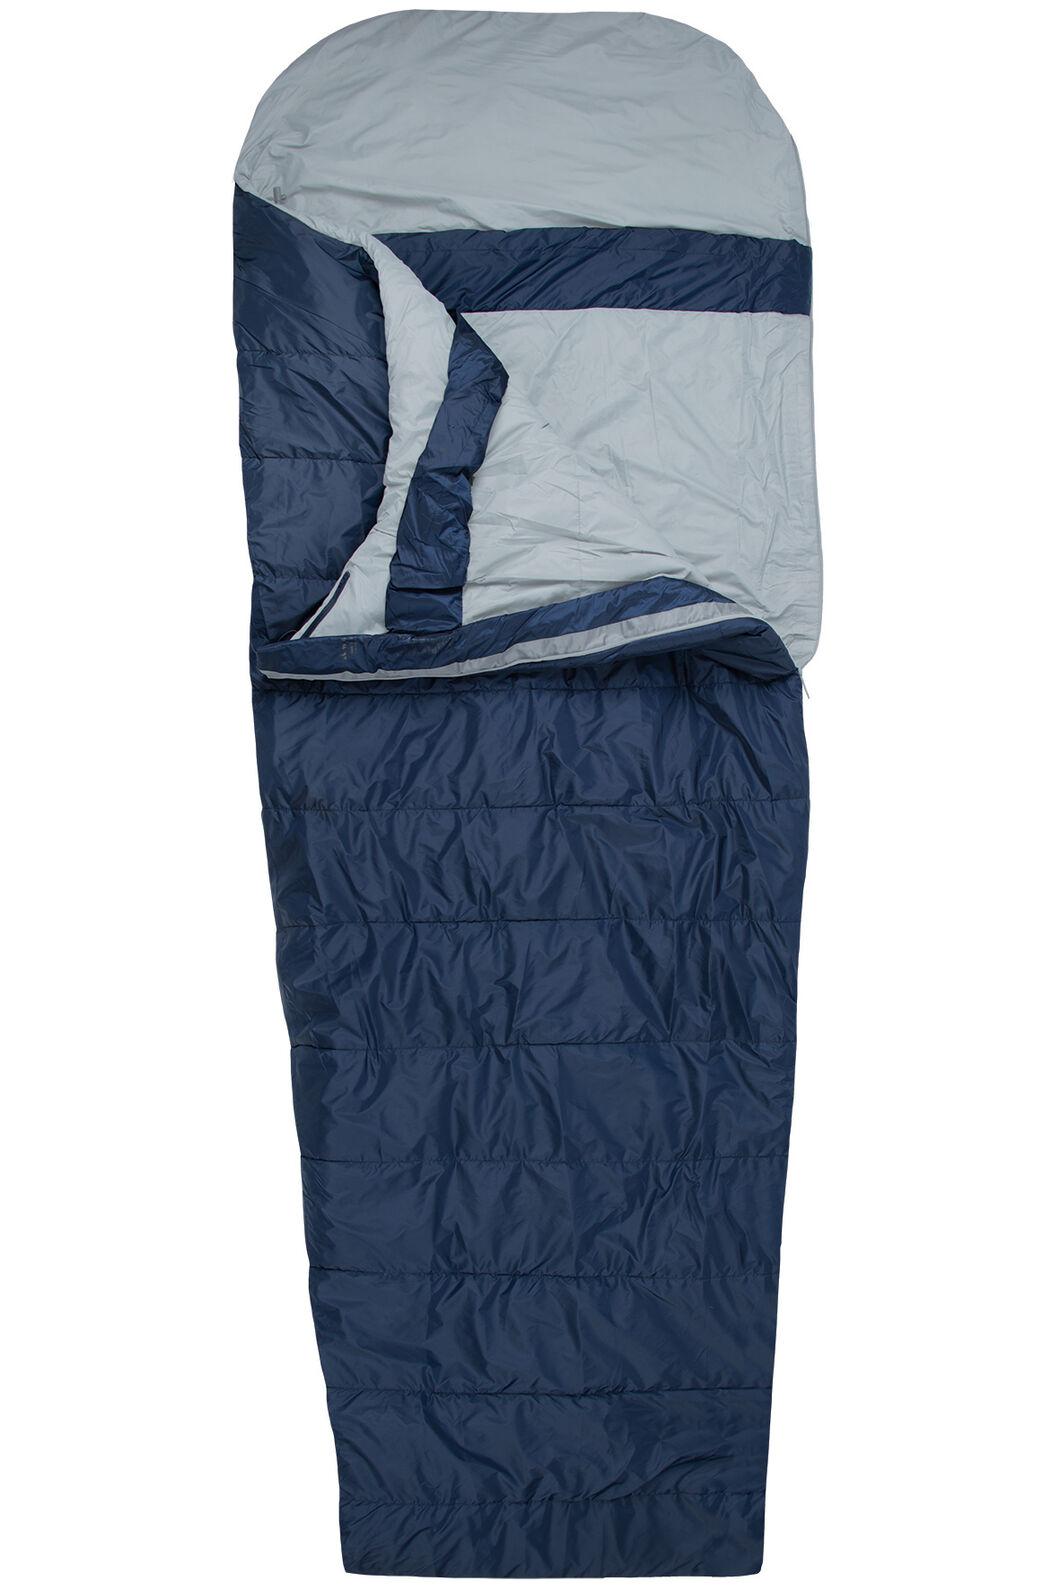 Macpac Roam Synthetic 150 Sleeping Bag - Standard, Black Iris, hi-res